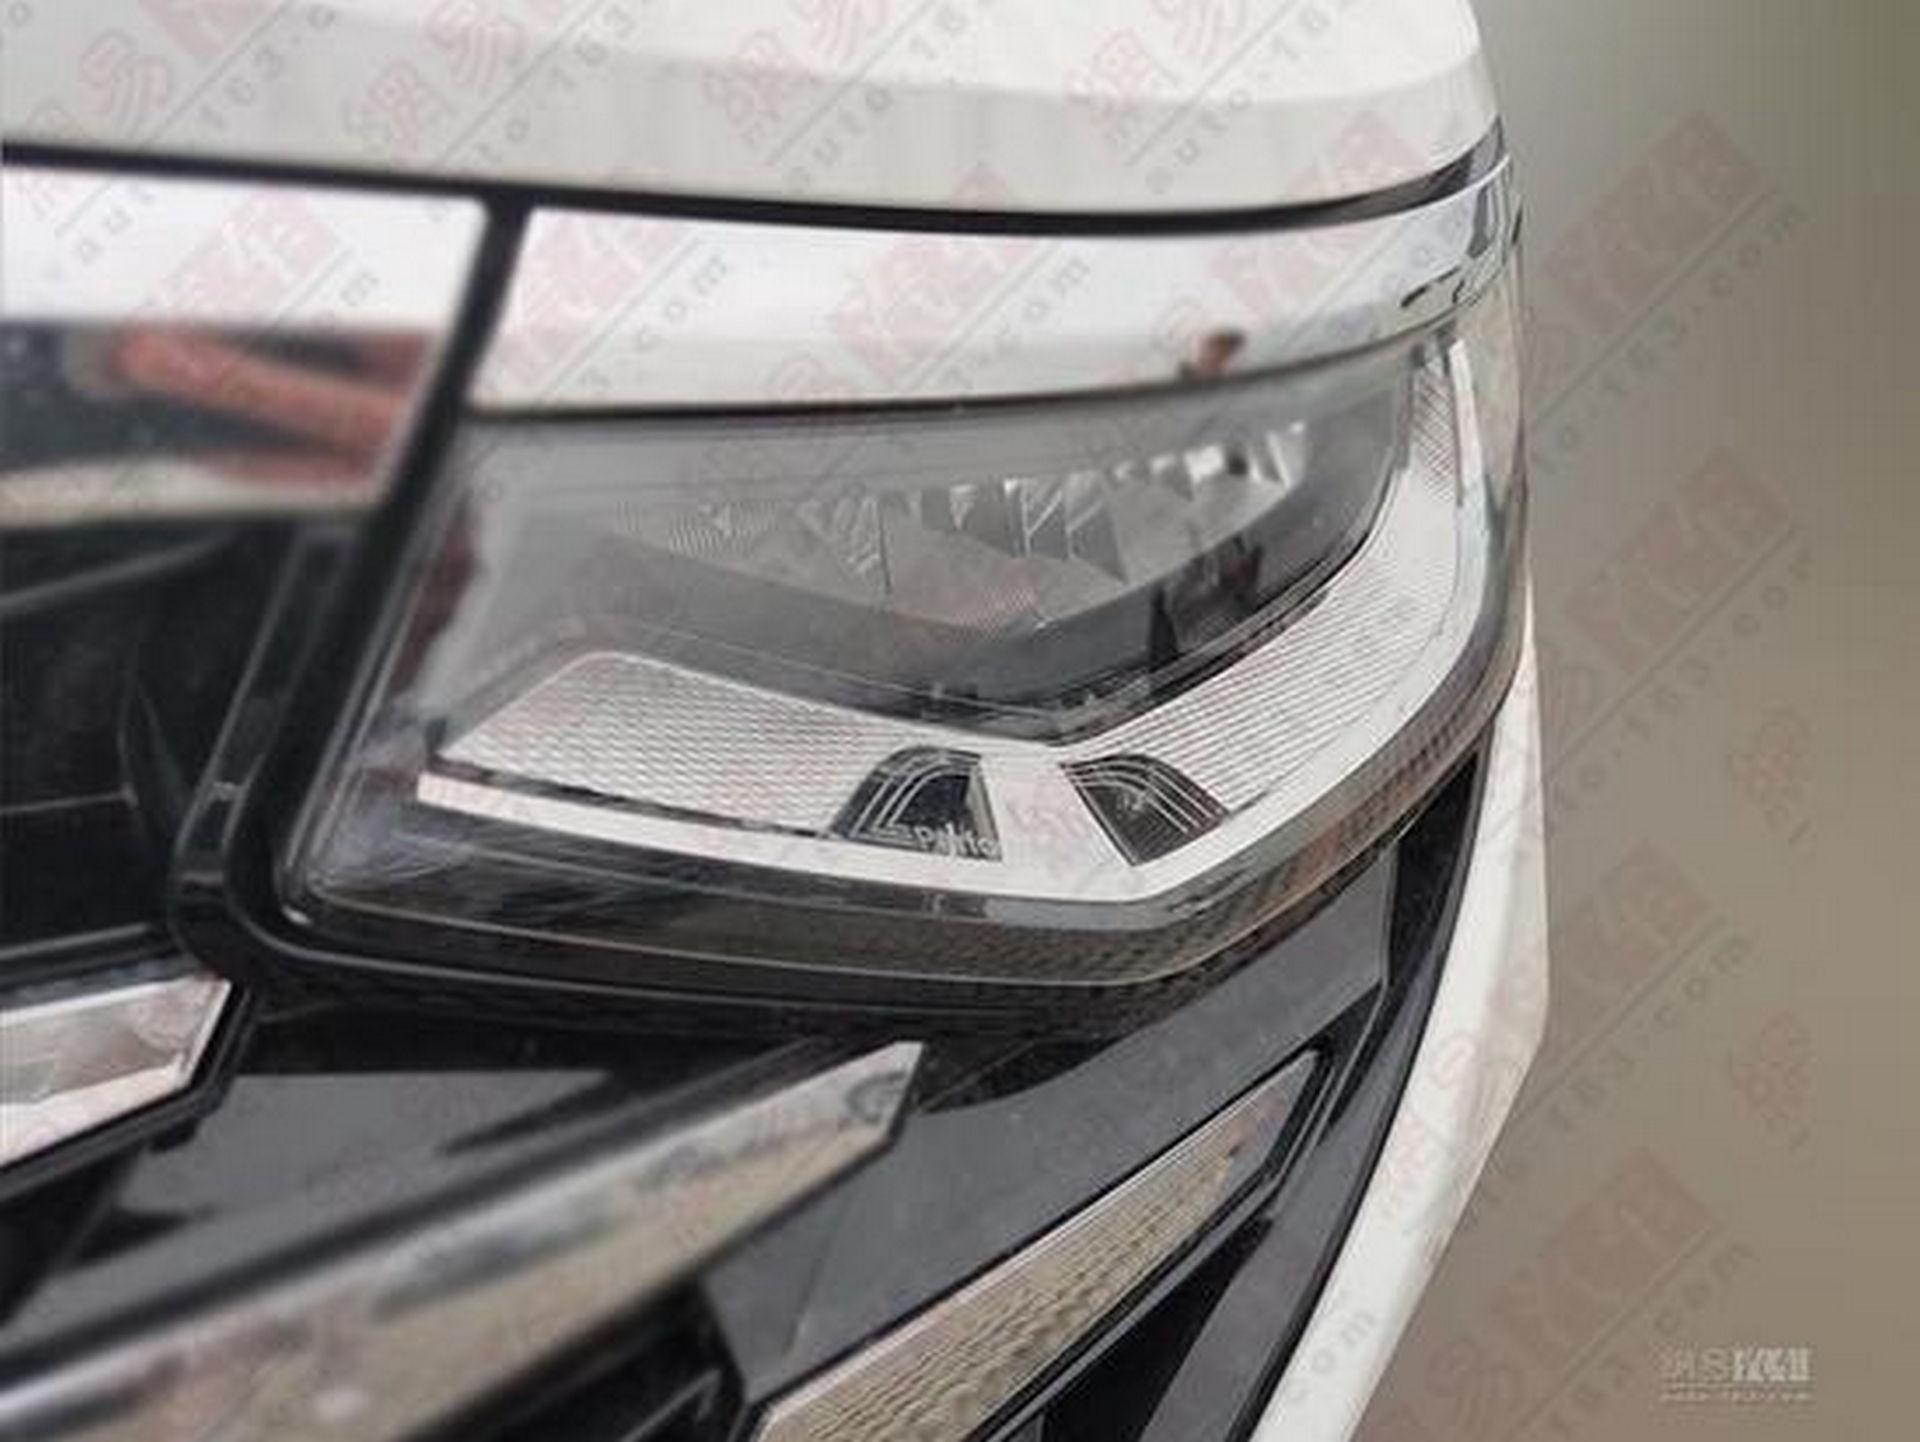 Hyundai_Custo_leaked_0006